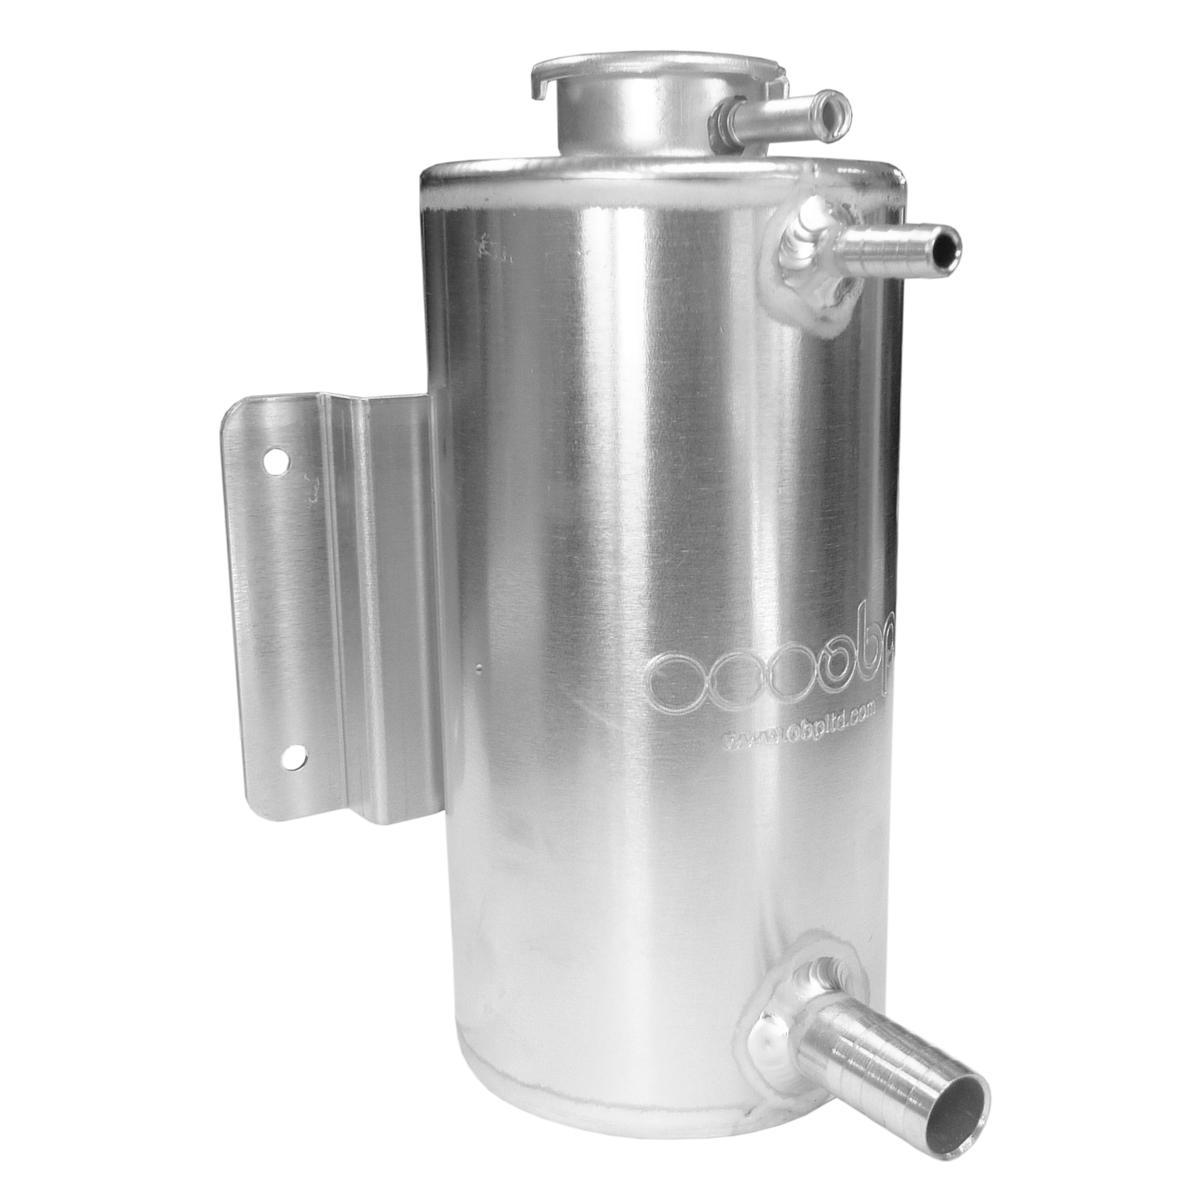 vertical aluminium water header tank from merlin motorsport. Black Bedroom Furniture Sets. Home Design Ideas